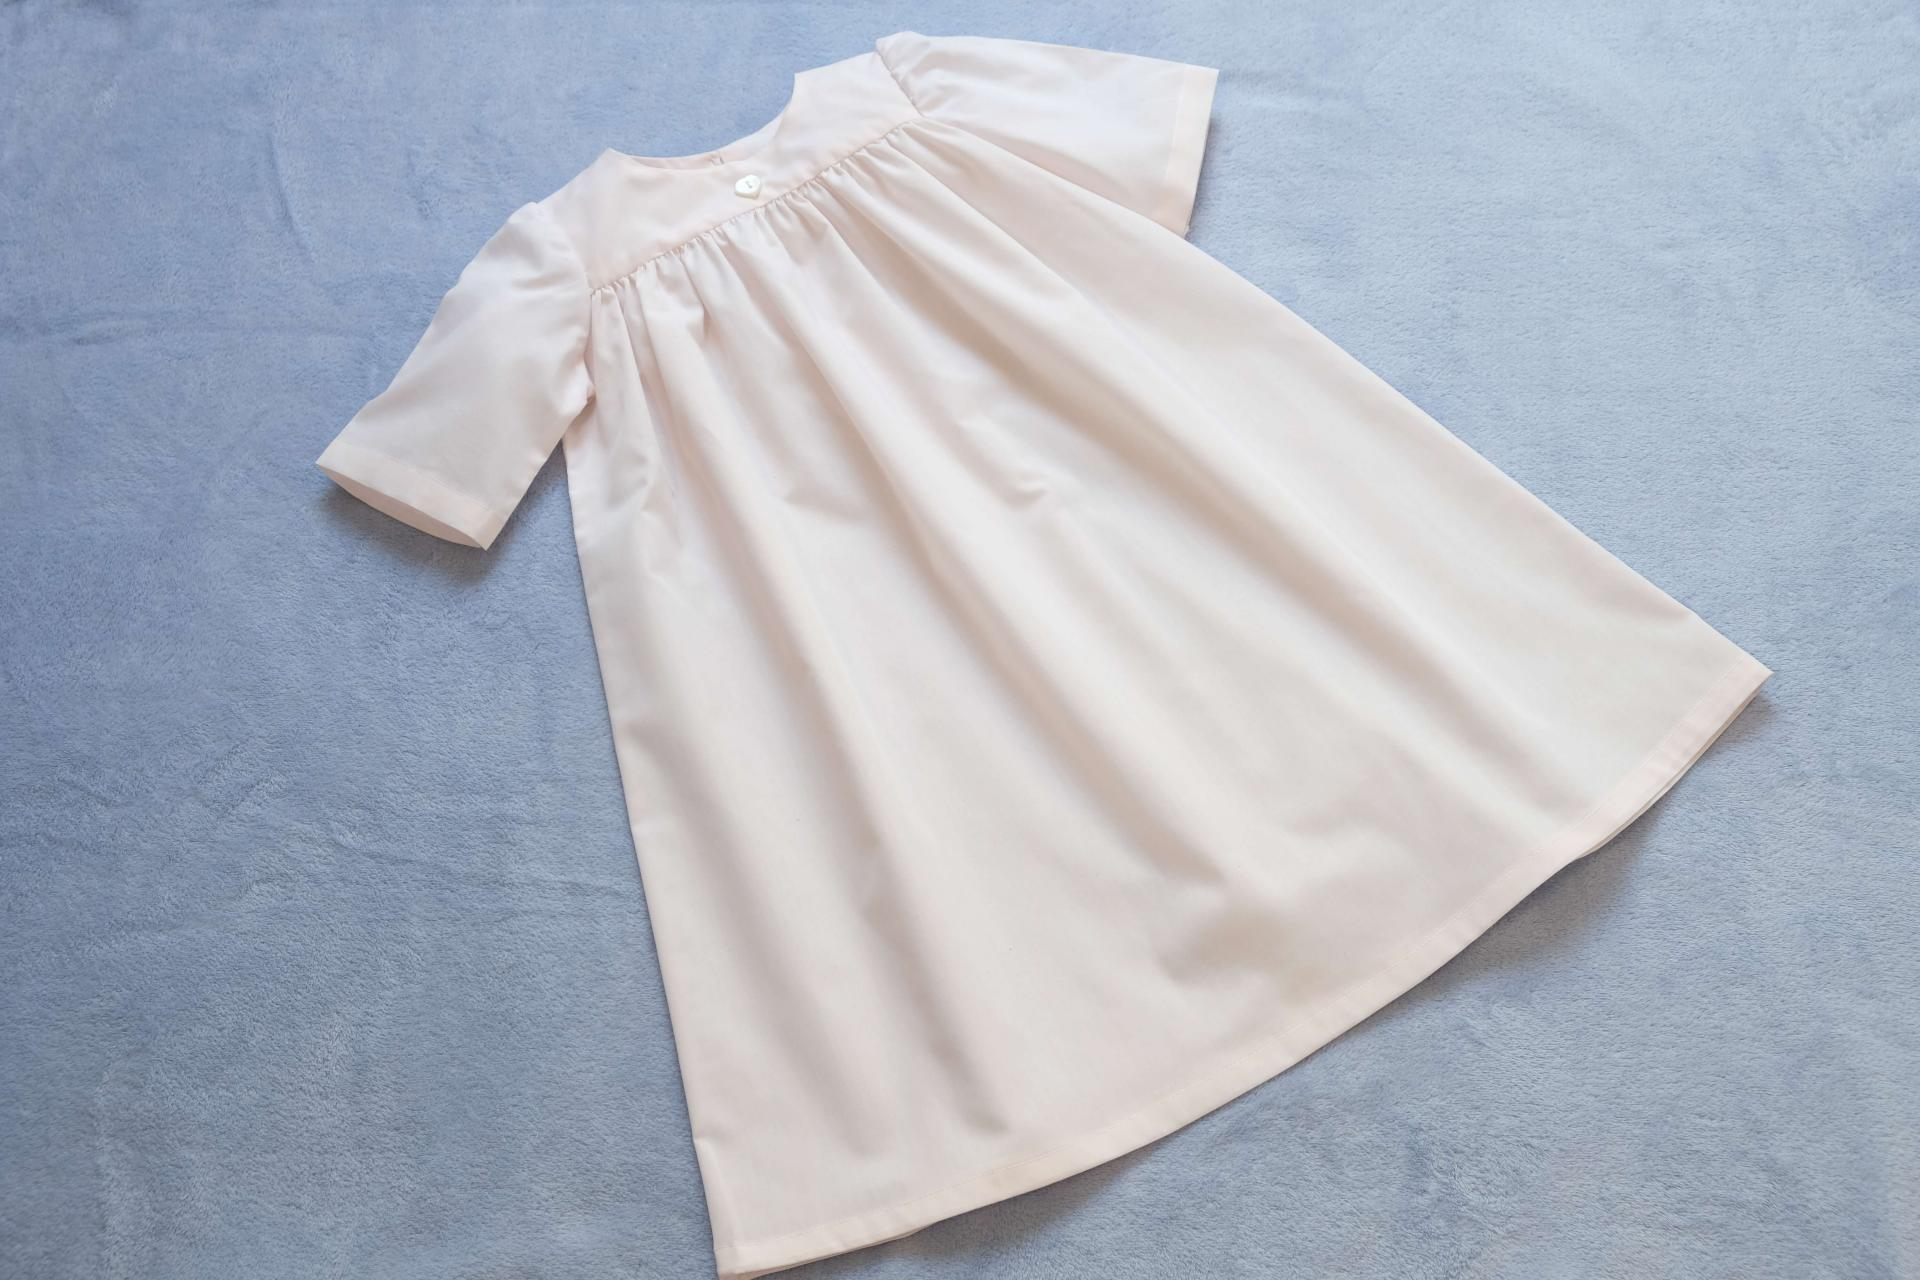 Chemise de nuit fille - Greta